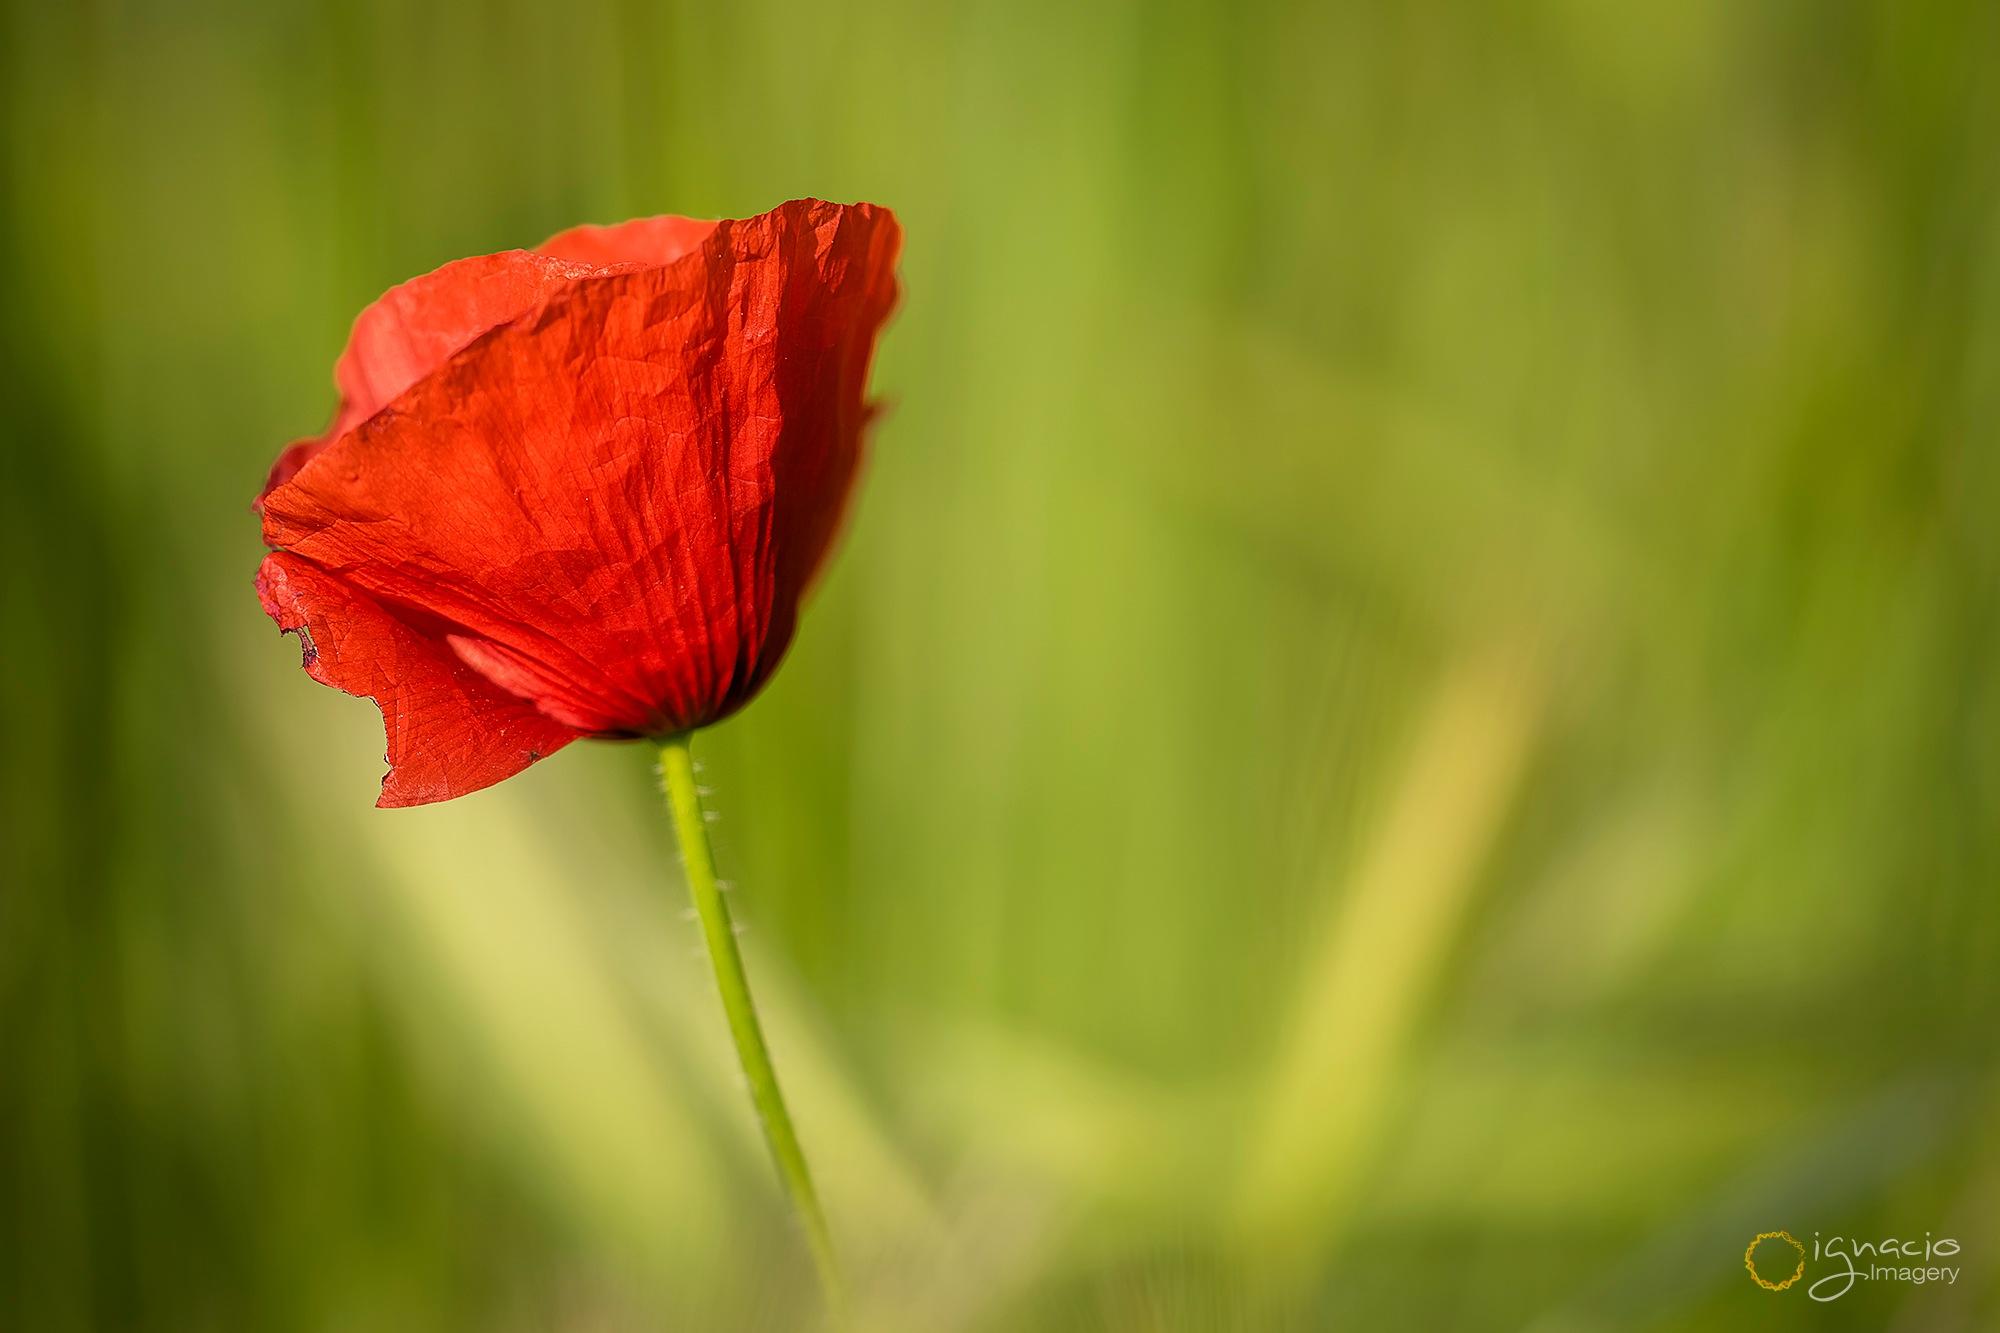 The poppy by Ignacio Leal Orozco